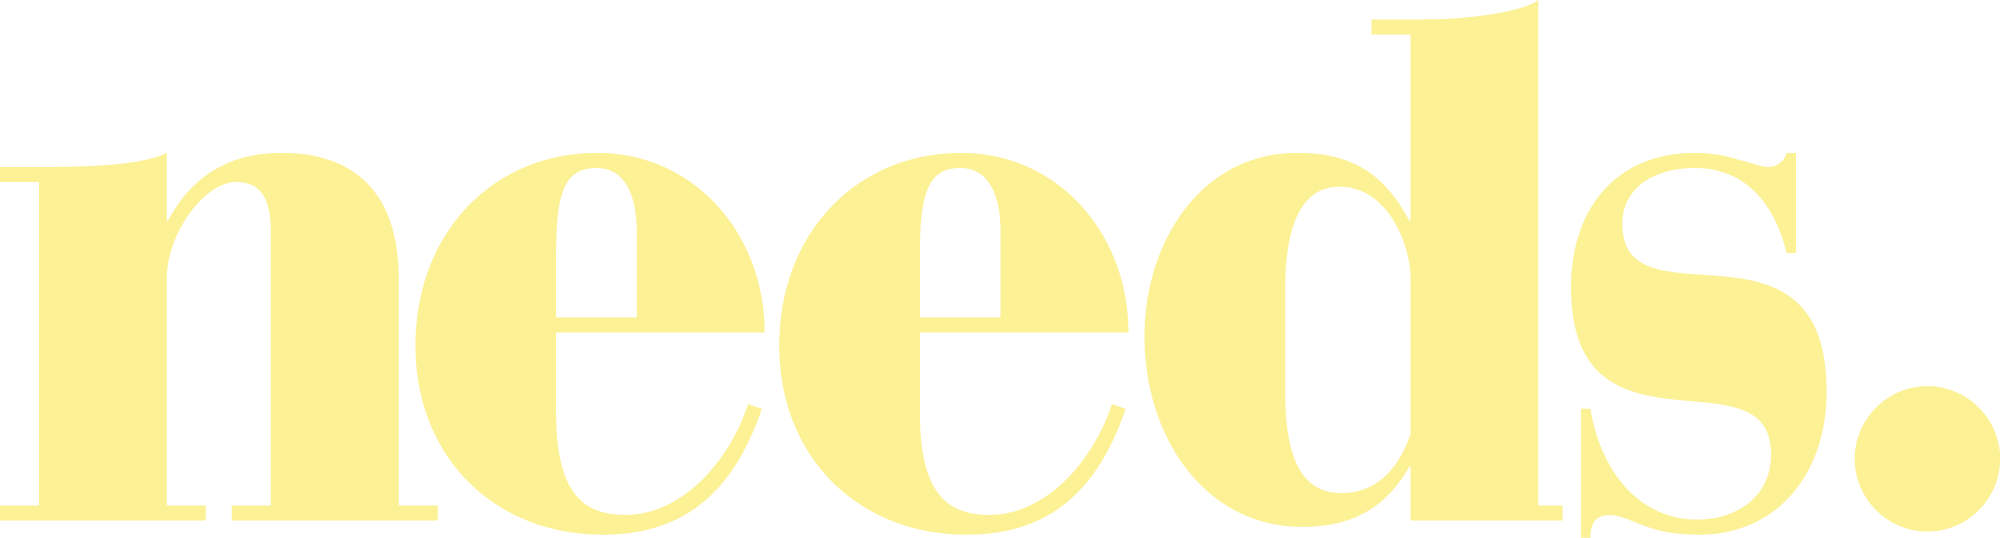 nedds-logo-yellow-1